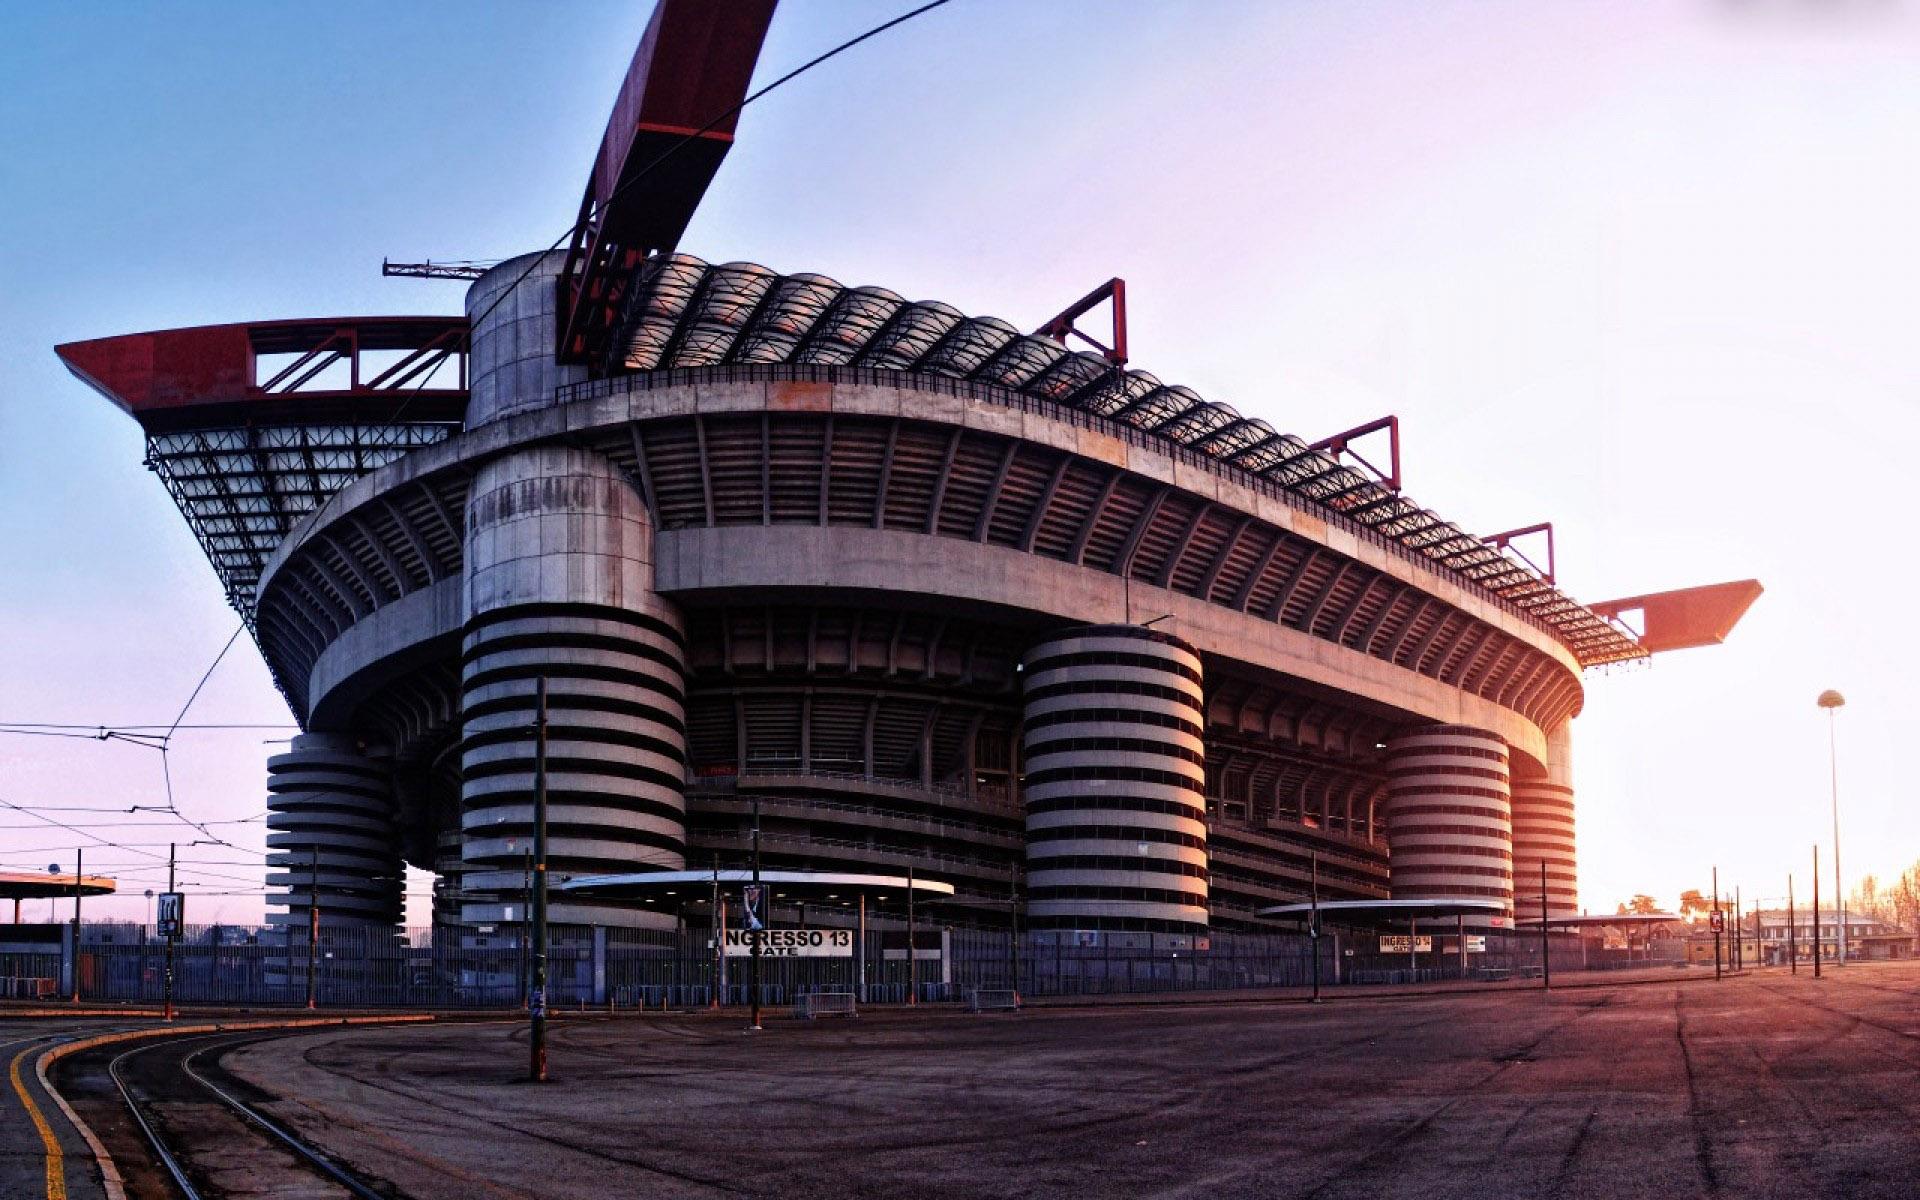 San Siro/Giuseppe Meazza Stadium